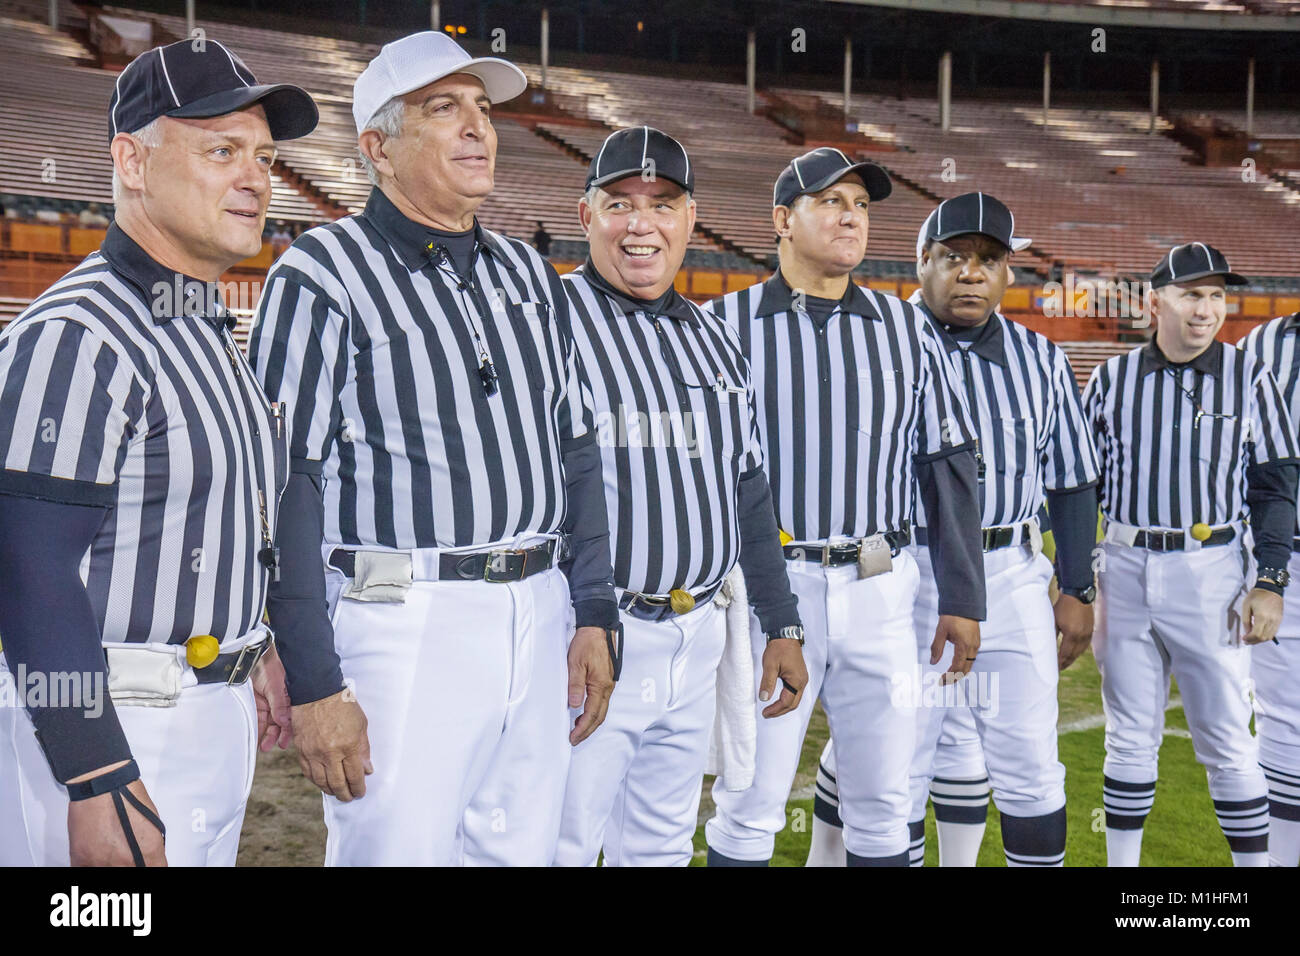 All American Offense Defense Bowl high school football referees officials striped uniforms Black man men - Stock Image